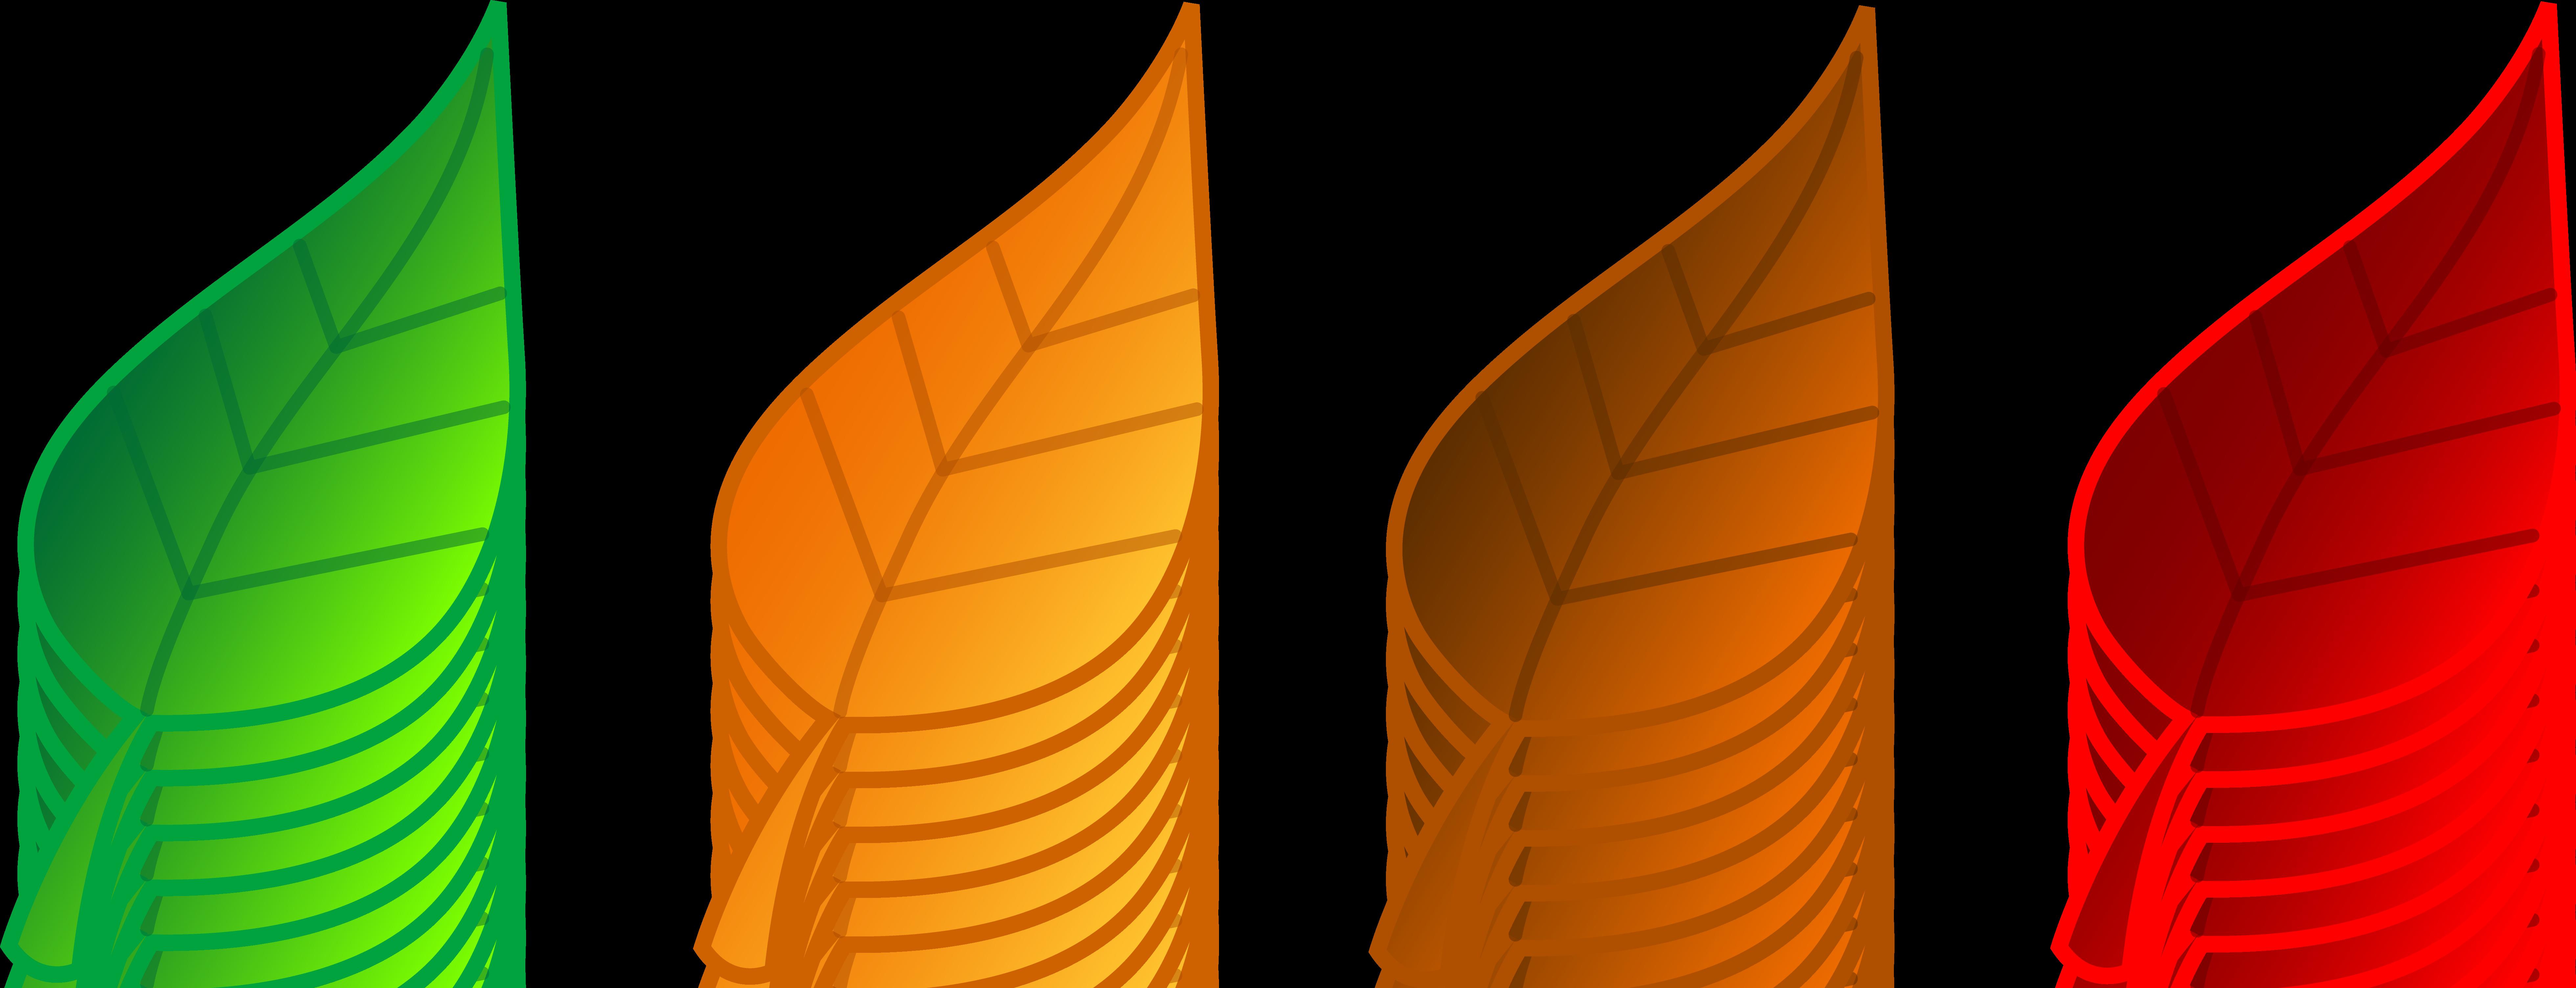 Free Clip Art Fall Borders |  - Autumn Leaves Clip Art